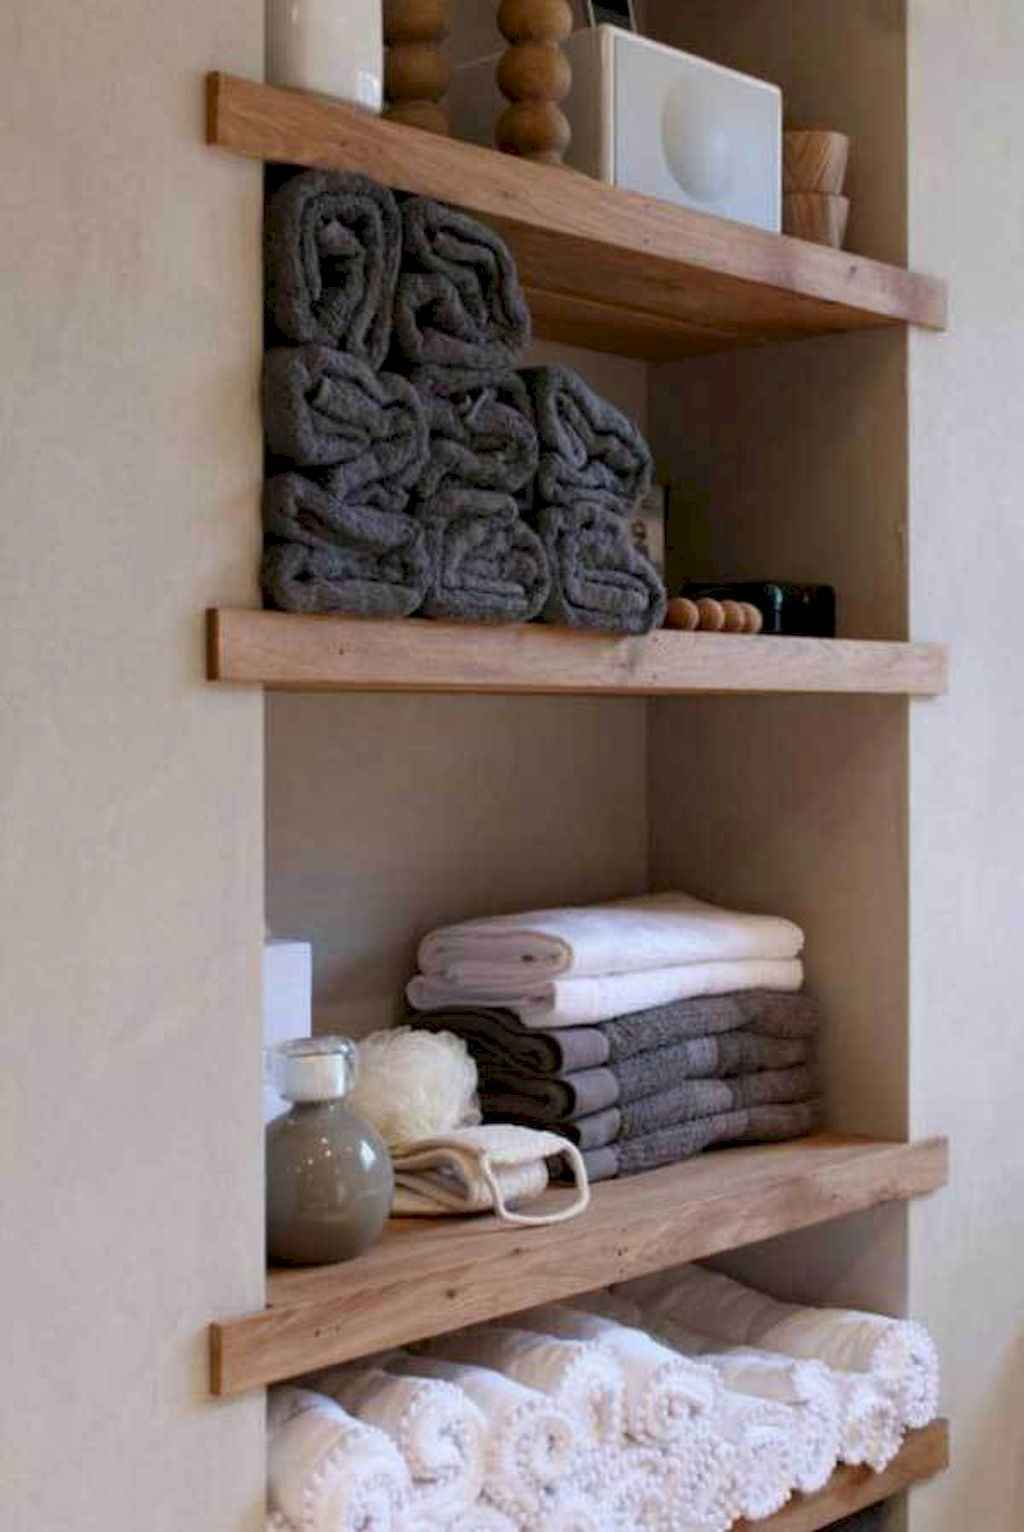 Cool bathroom storage shelves organization ideas (48)